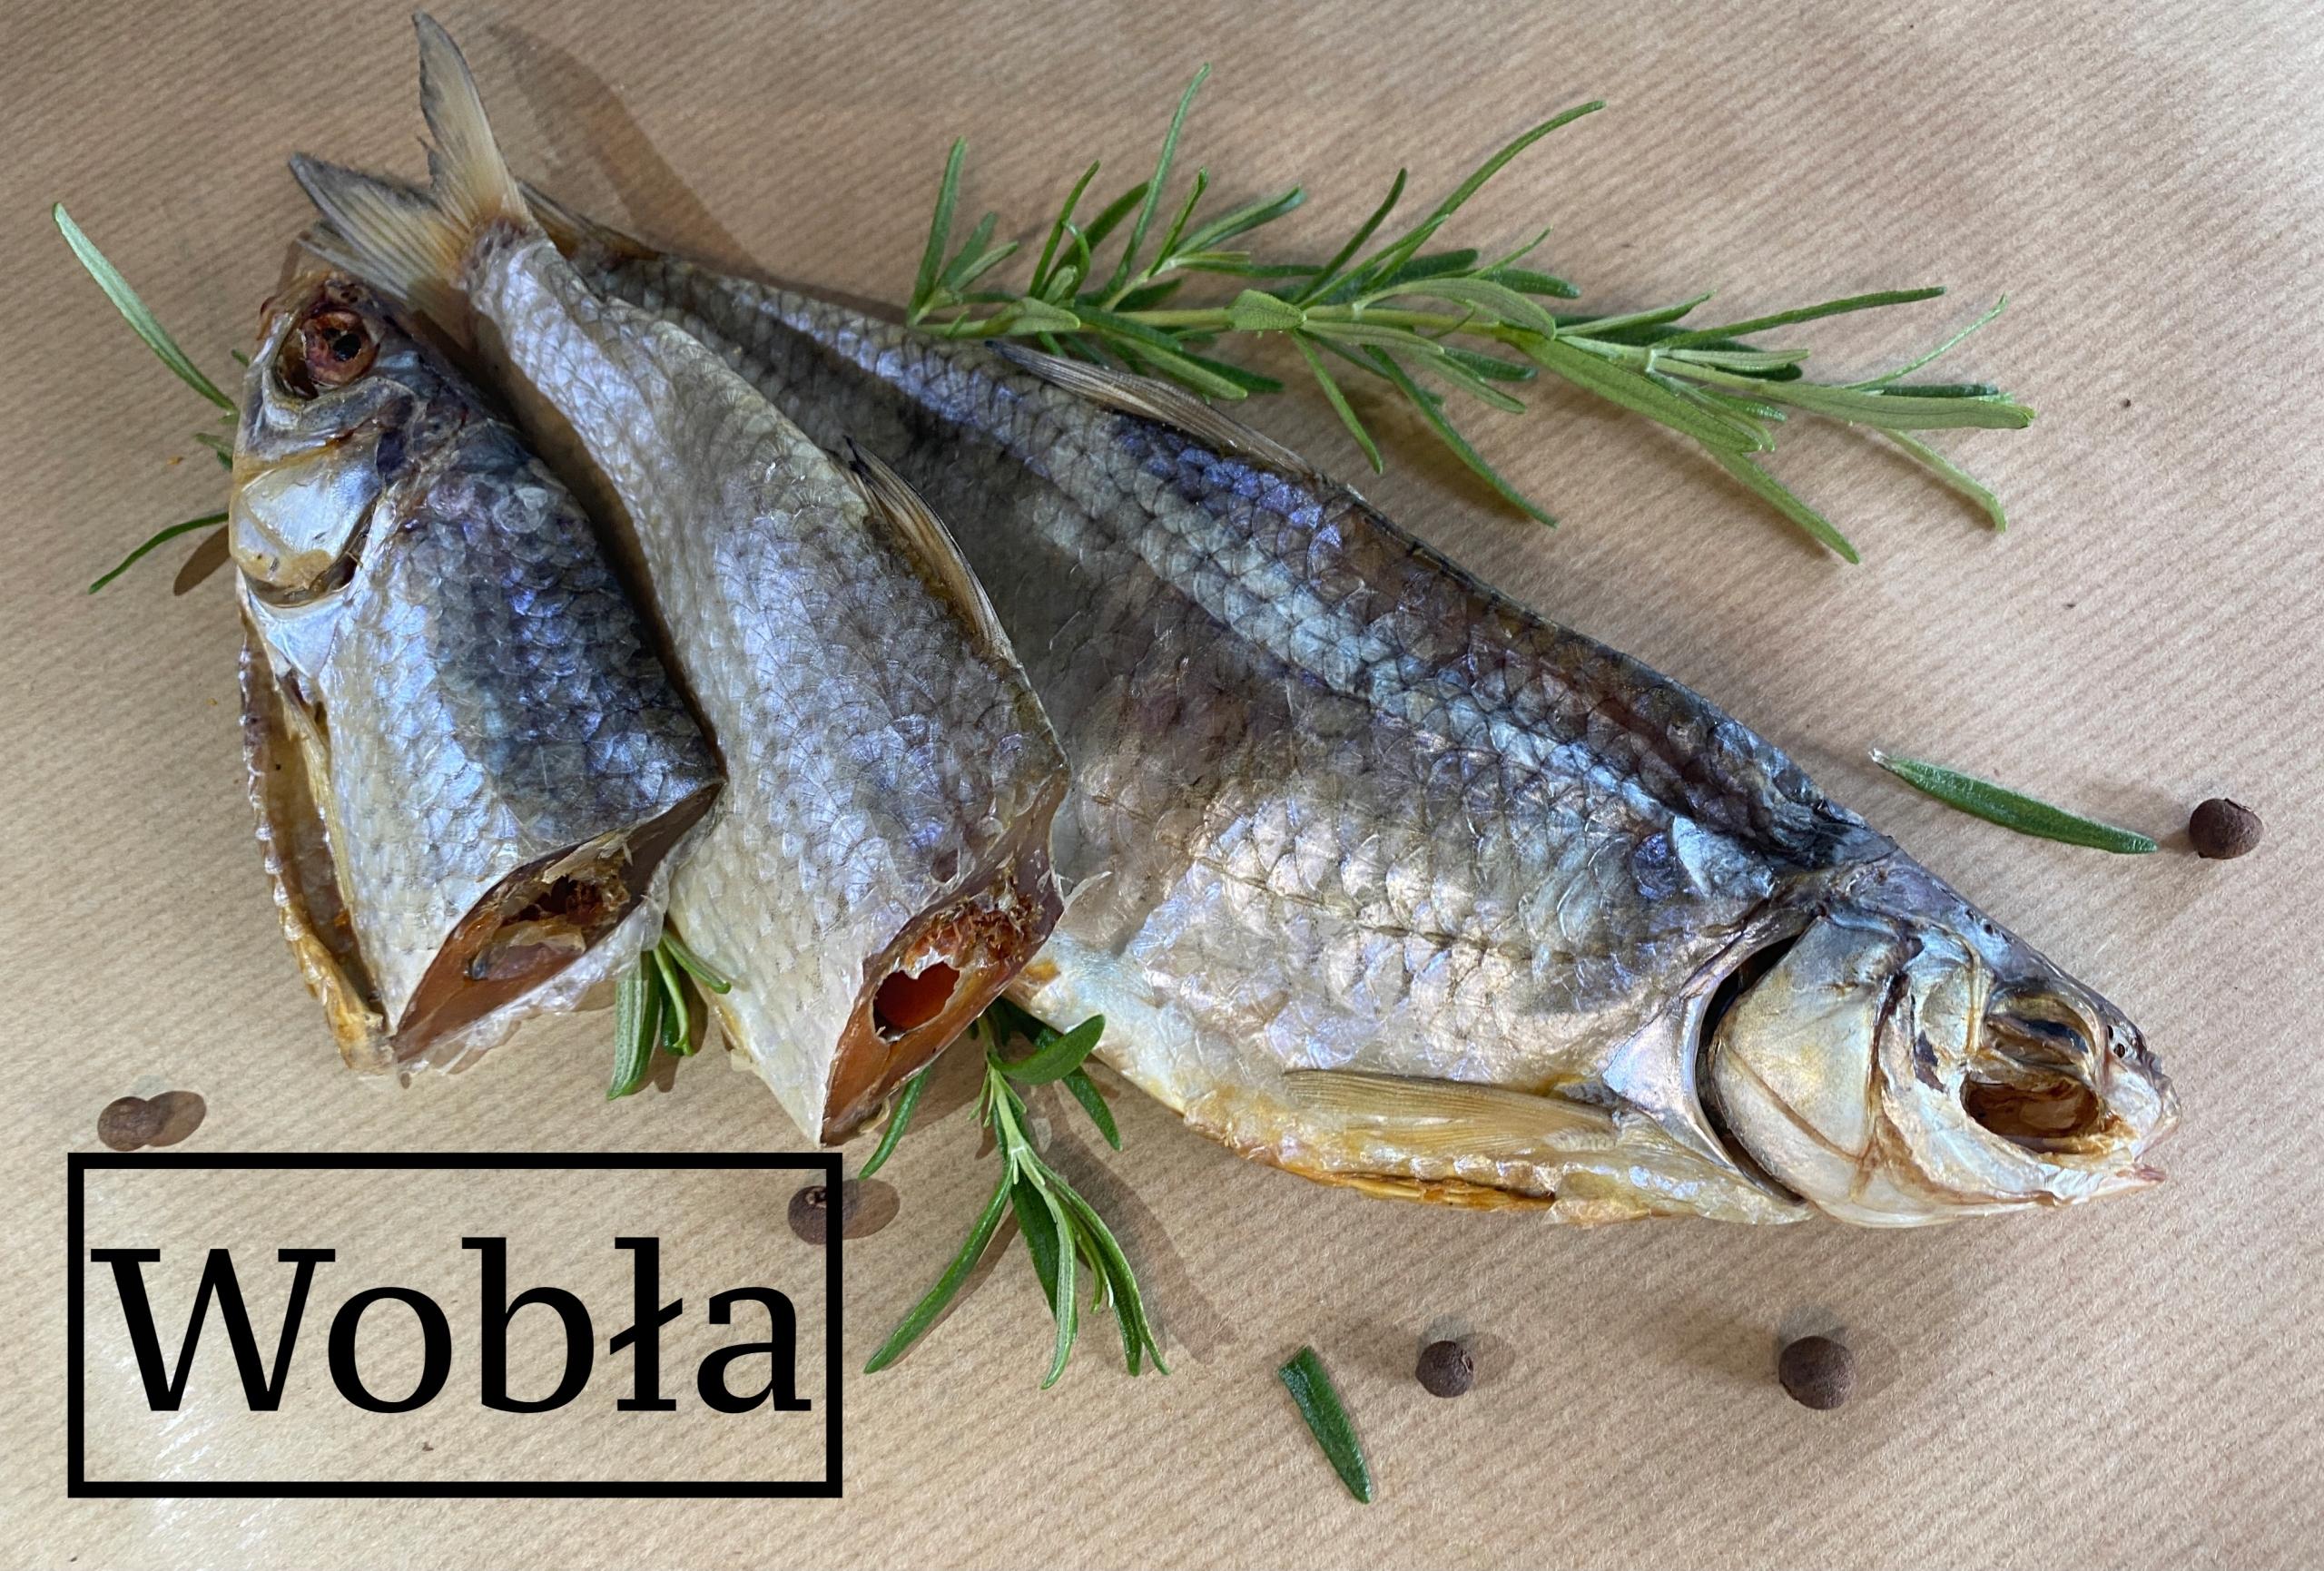 Вобла (каспийская плотва) Сушеная рыба 500 +/- 10 г x 20 шт.